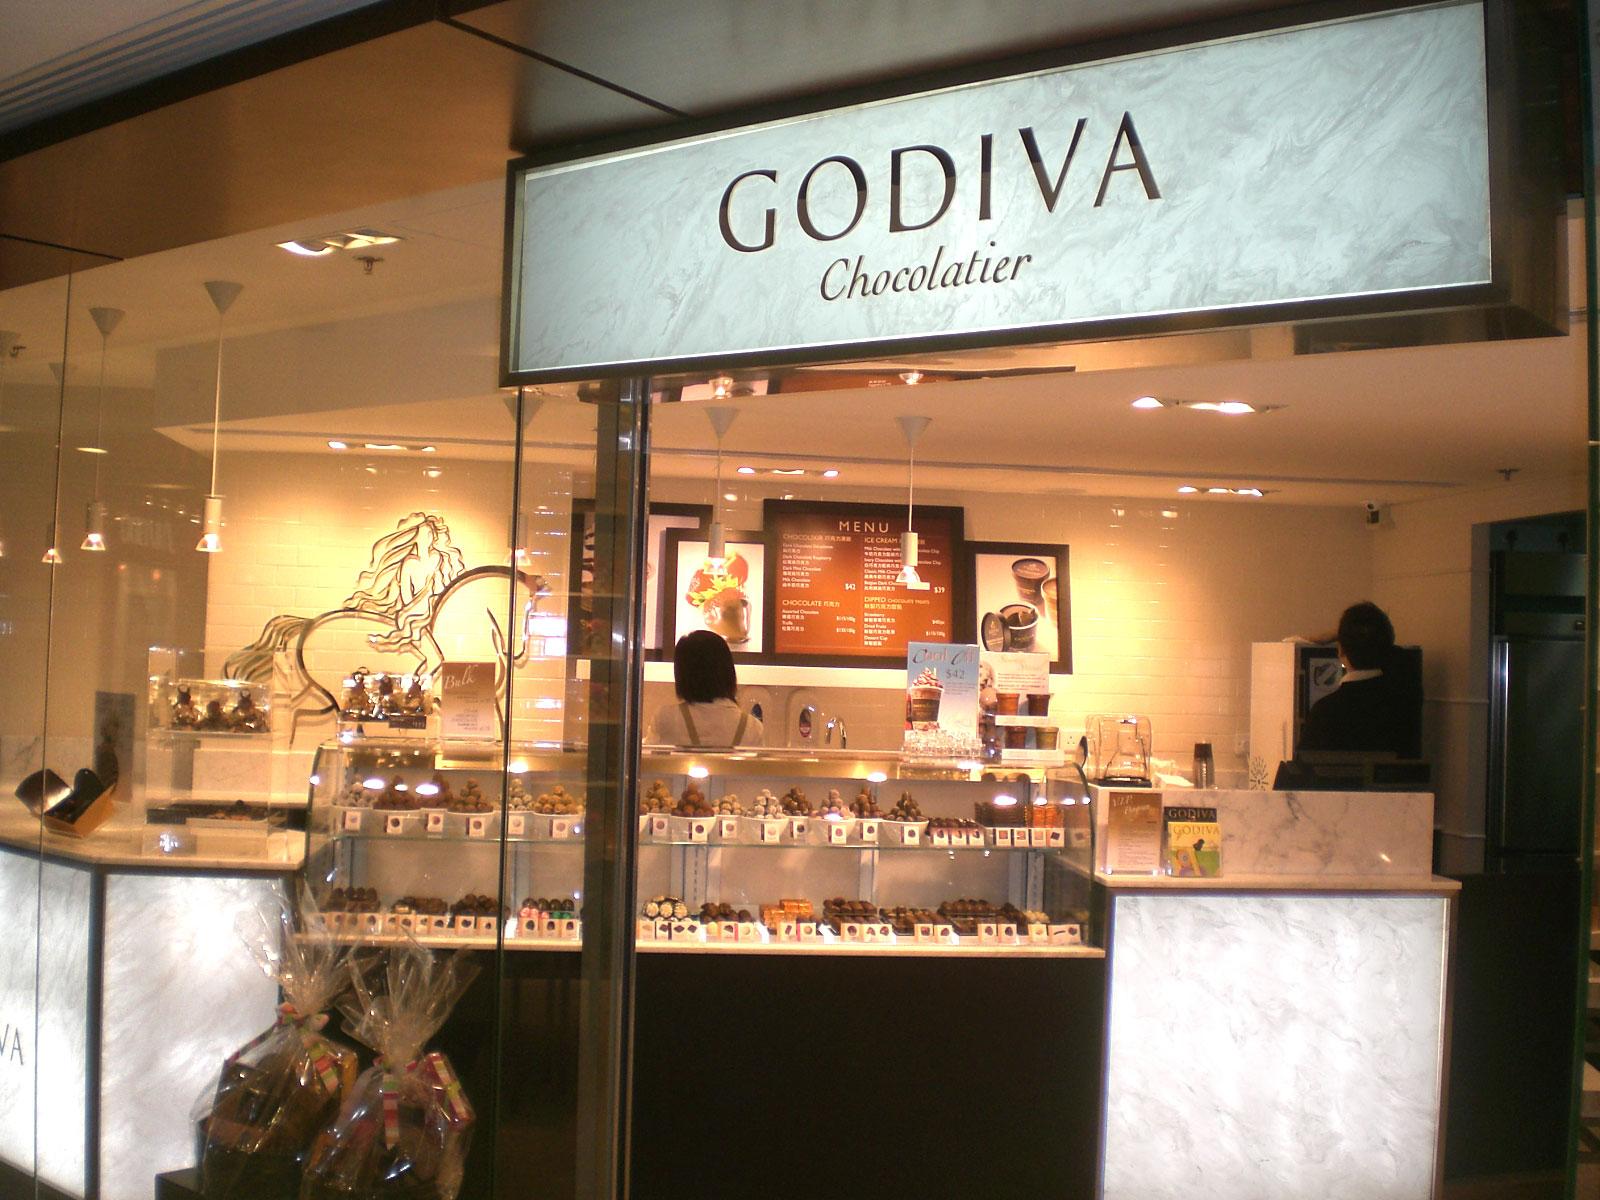 Godiva chocolate k sharif godiva finest belgian for Go diva